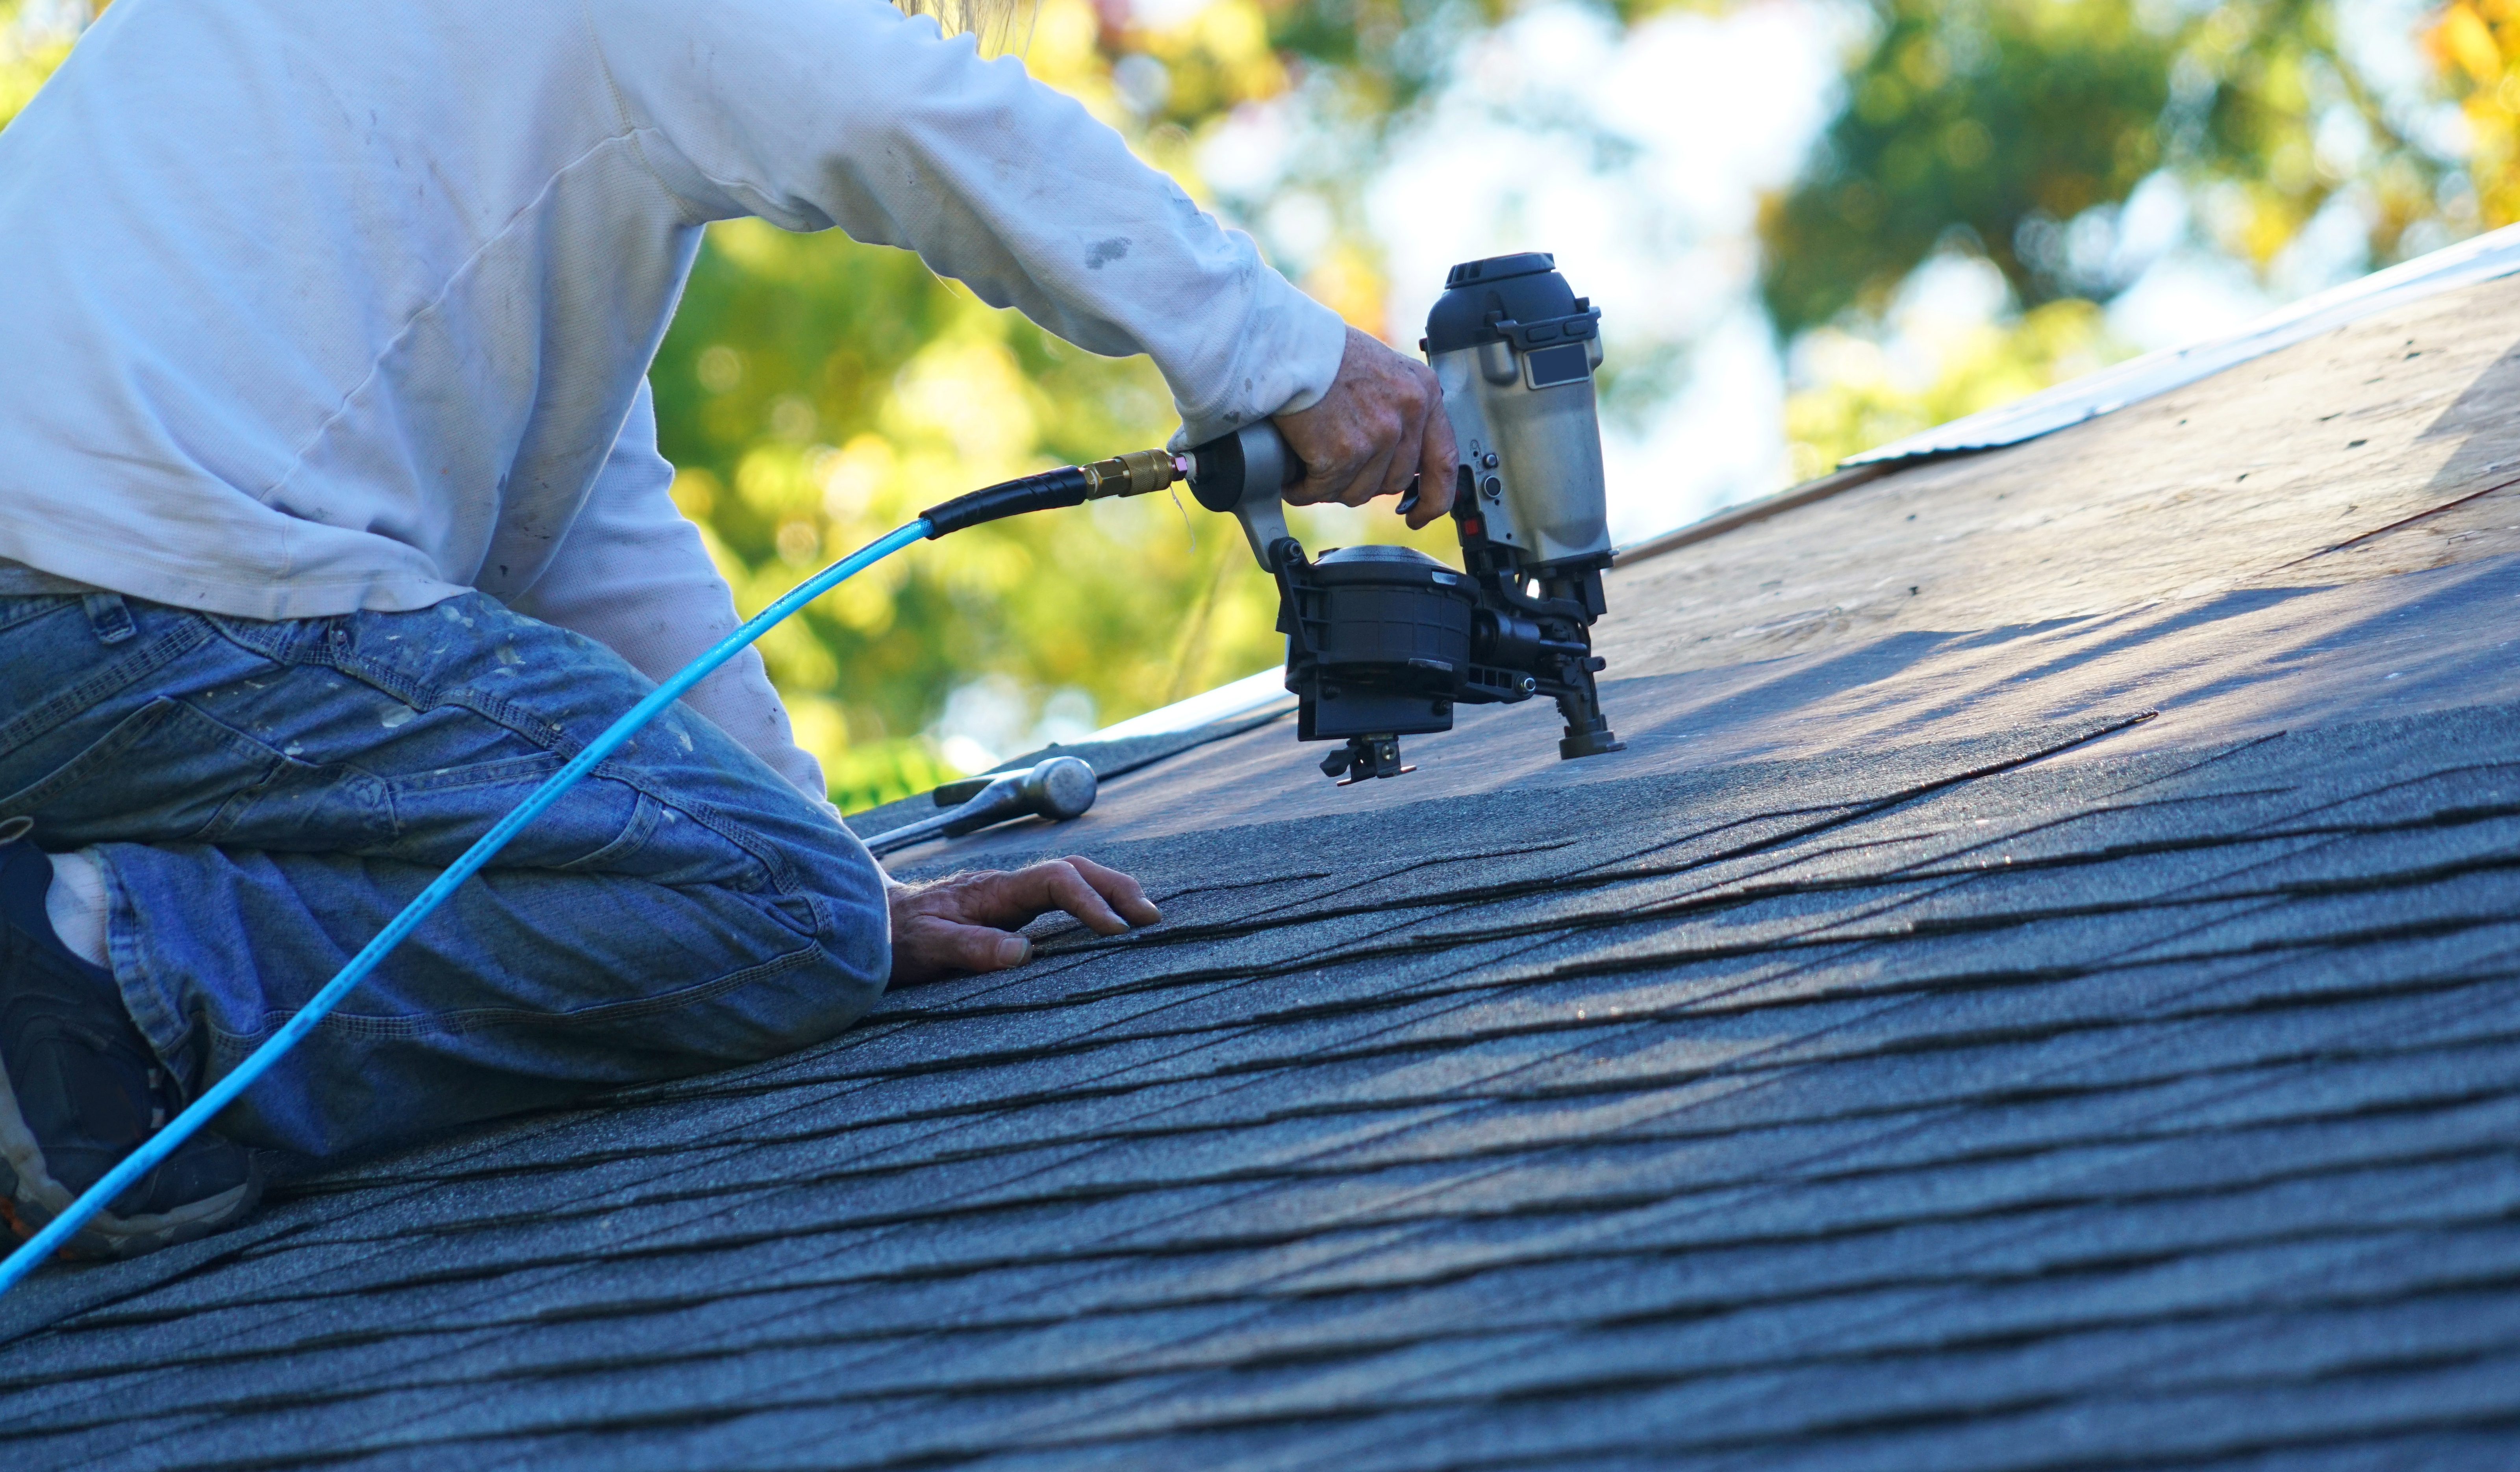 Roofer nail gun re-roof